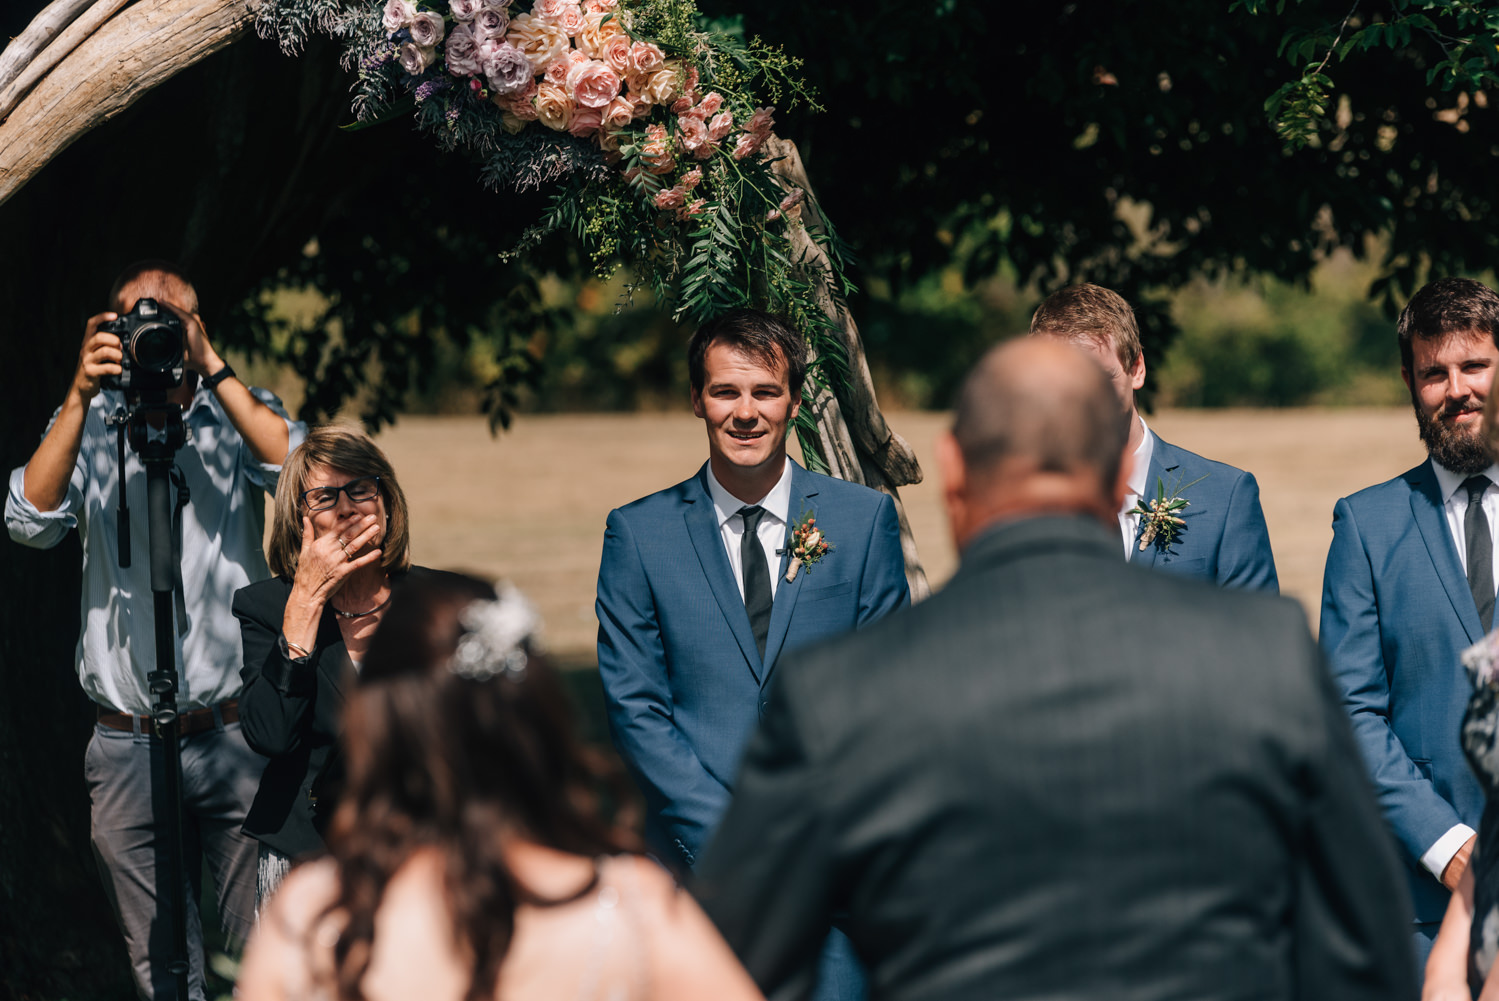 Quamby-Wedding-Photographer-67.jpg